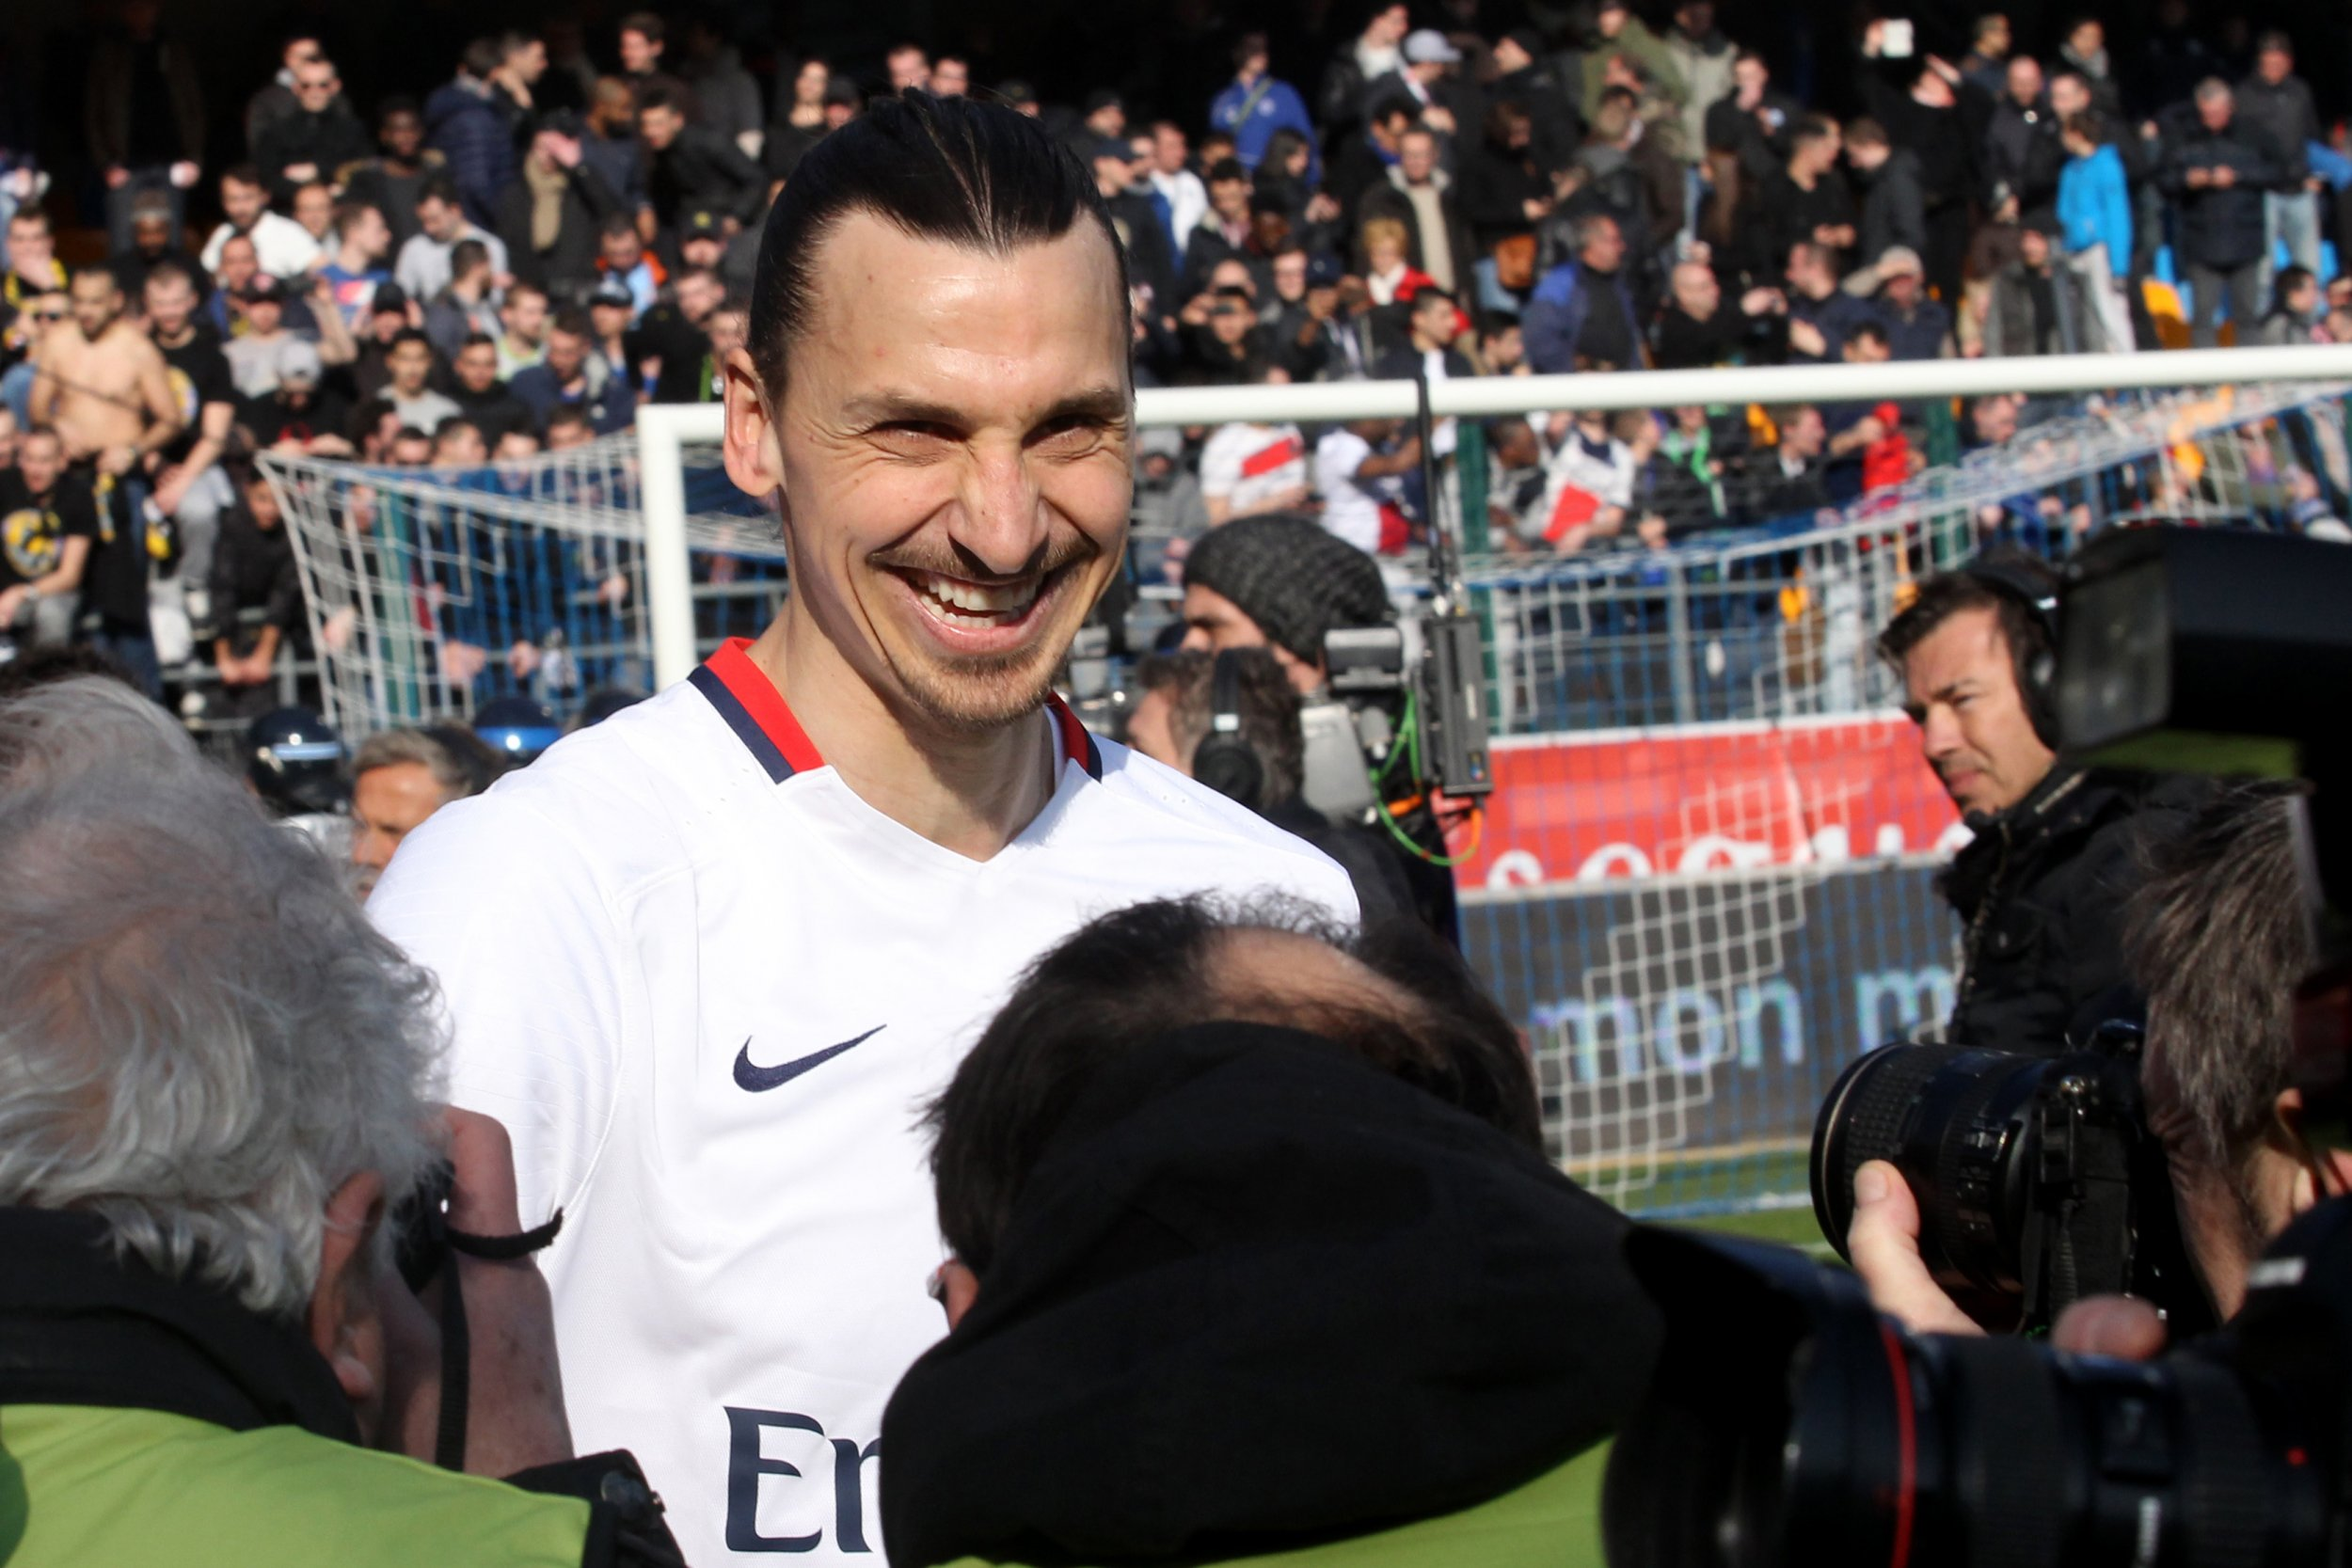 Zlatan Ibrahimovic has confirmed he will leave Paris Saint-Germain this summer.